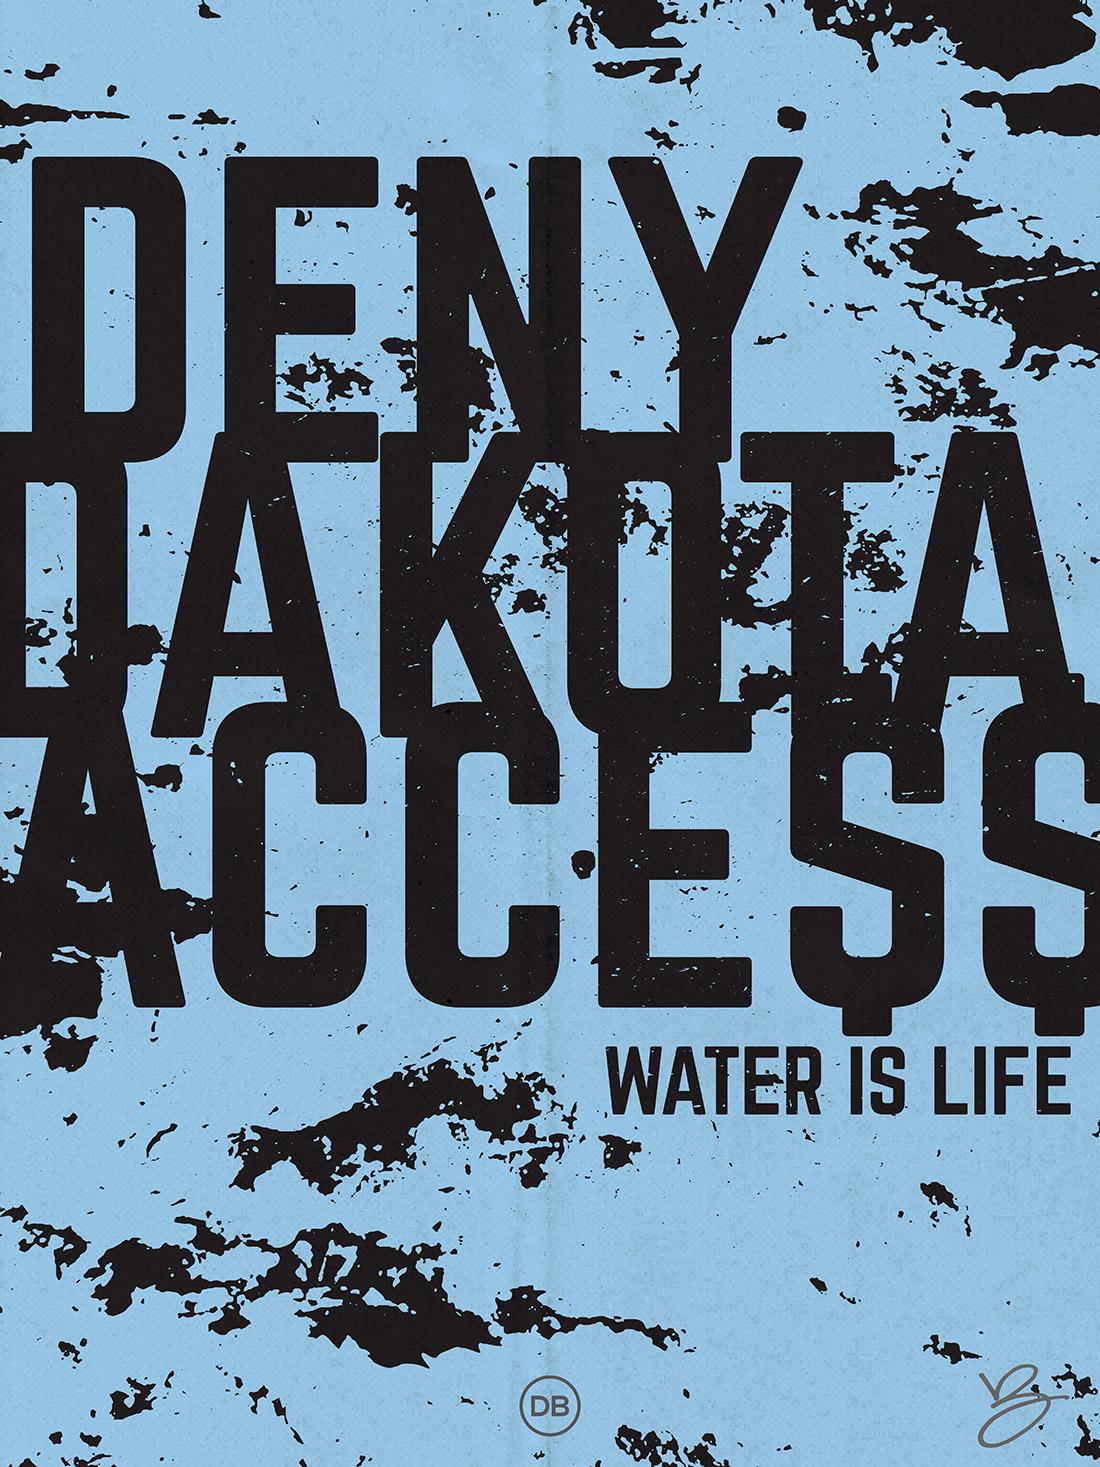 David Bernie Deny Dakota Access Indian Country 52 Week 34